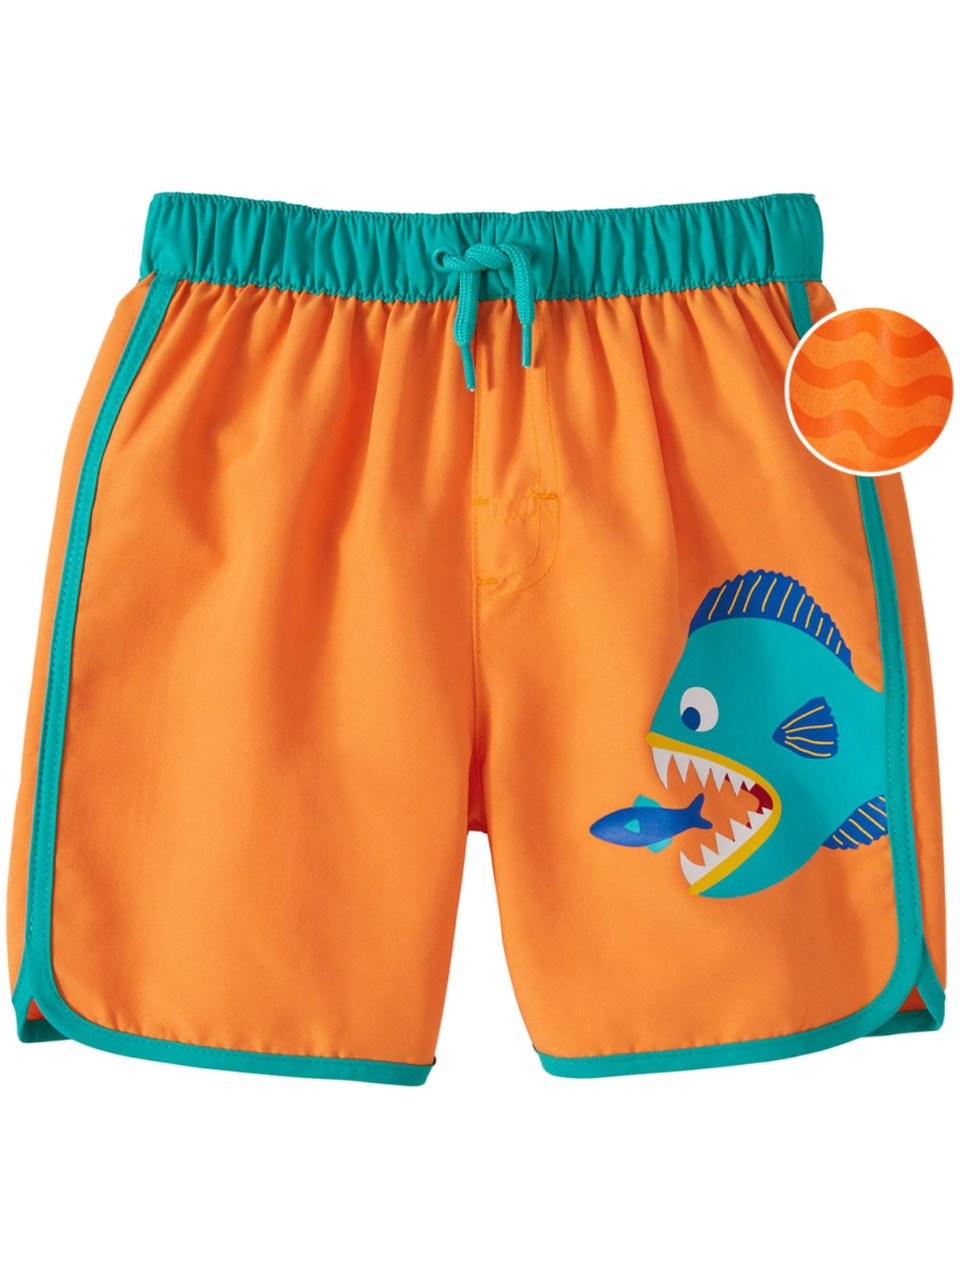 Boys Piranha Fish Swimming Trunks